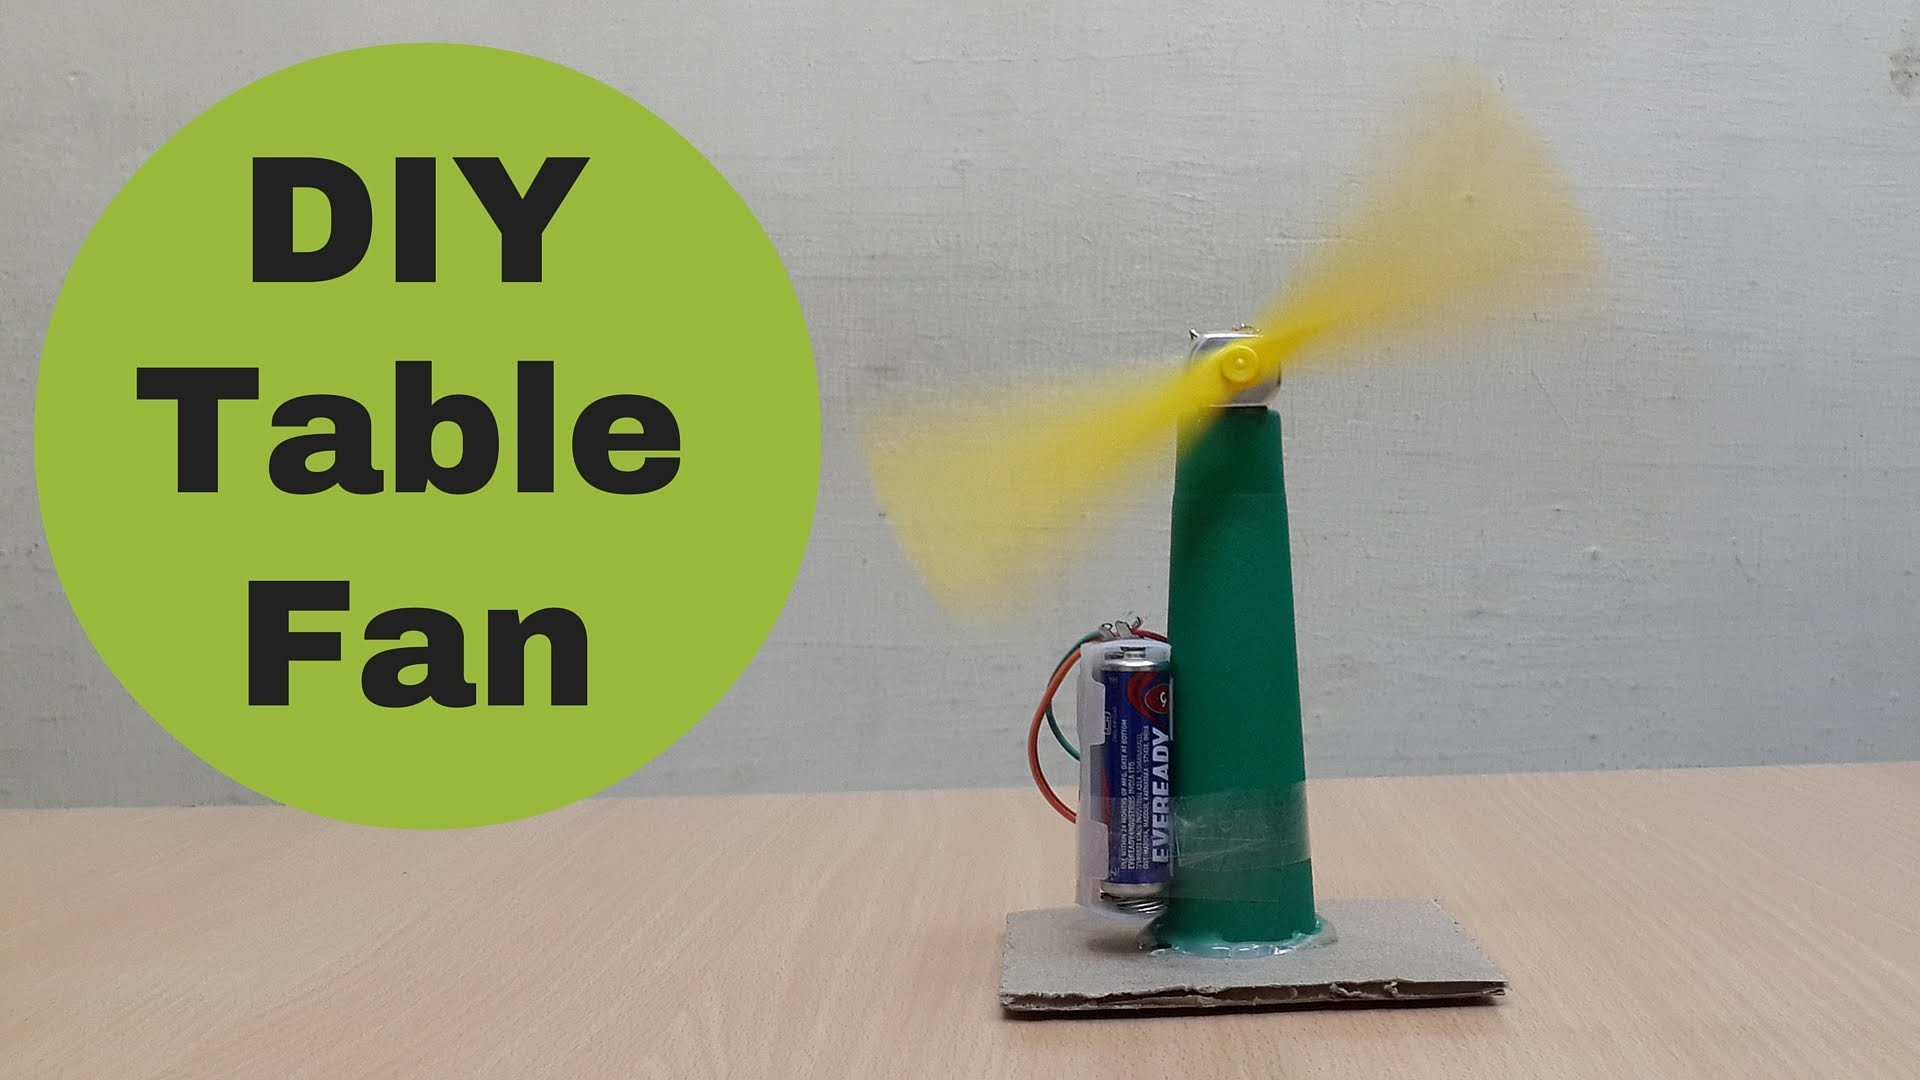 How to Make a Homemade Mini Table Fan - Very Easy DIY Fan